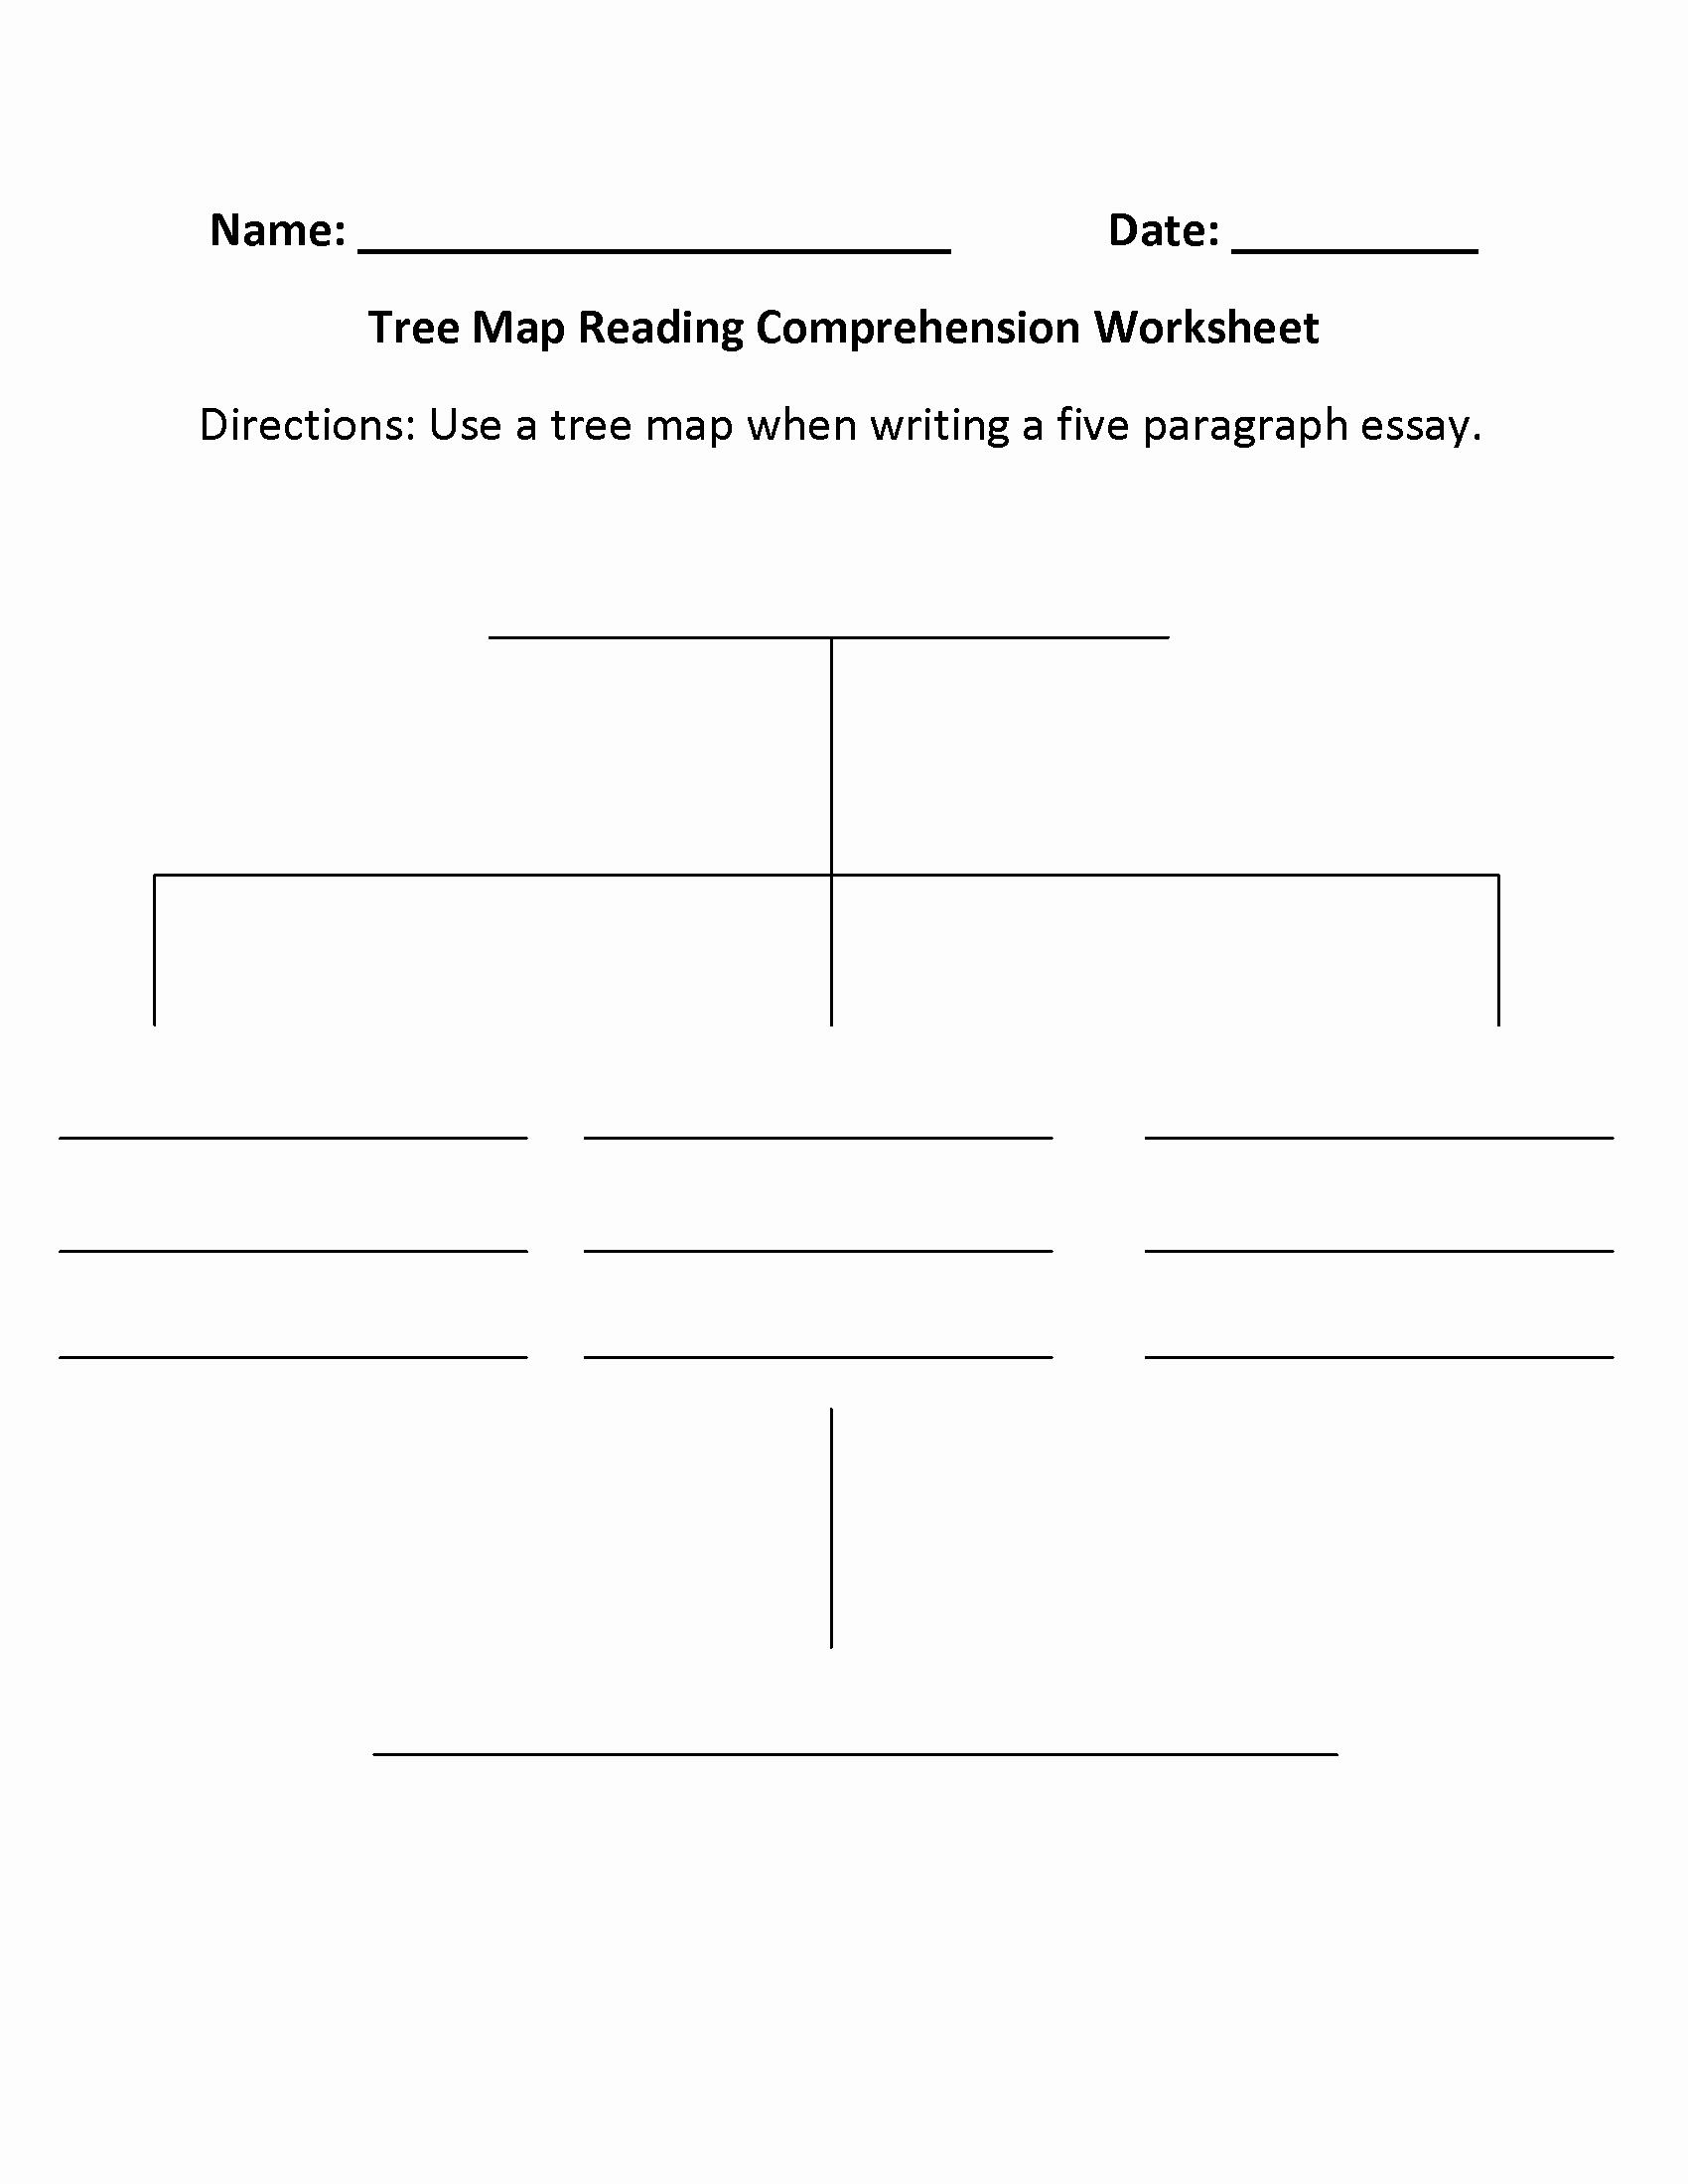 5th Grade Main Idea Worksheets Luxury 10 Spectacular Main Idea Worksheets for 5th Grade 2020